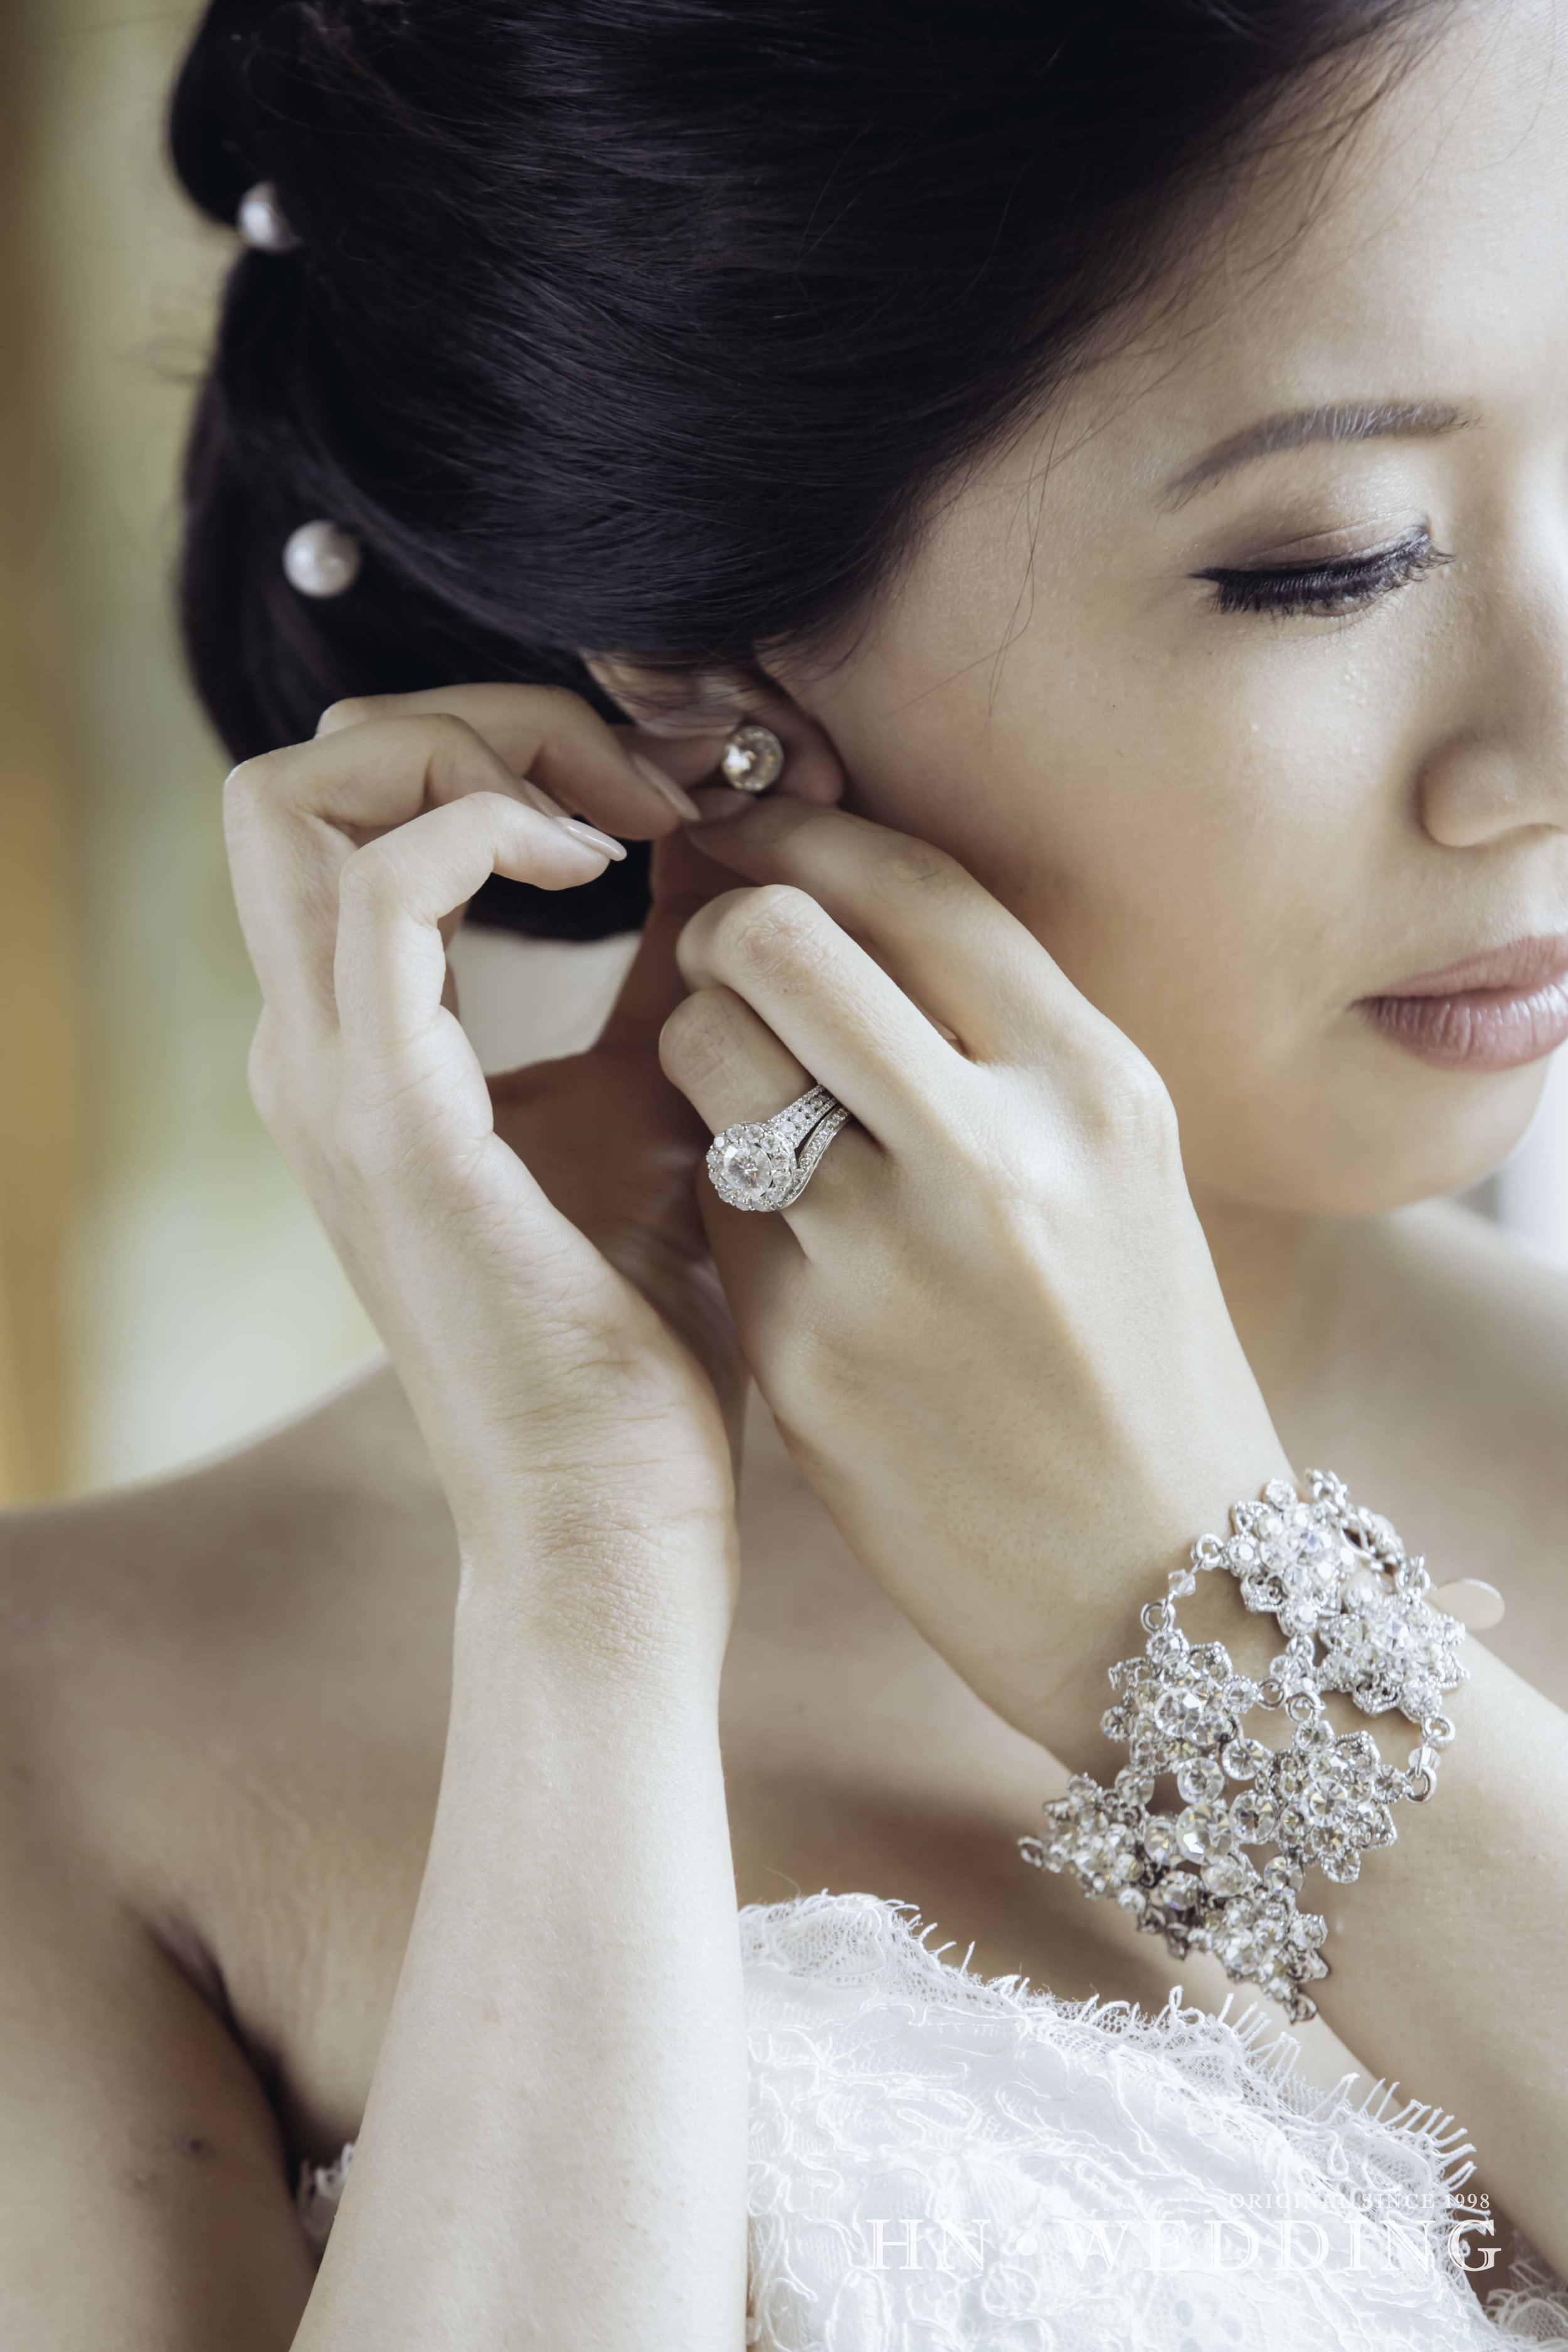 HNwedding-makeup-prewedding-0939.jpg